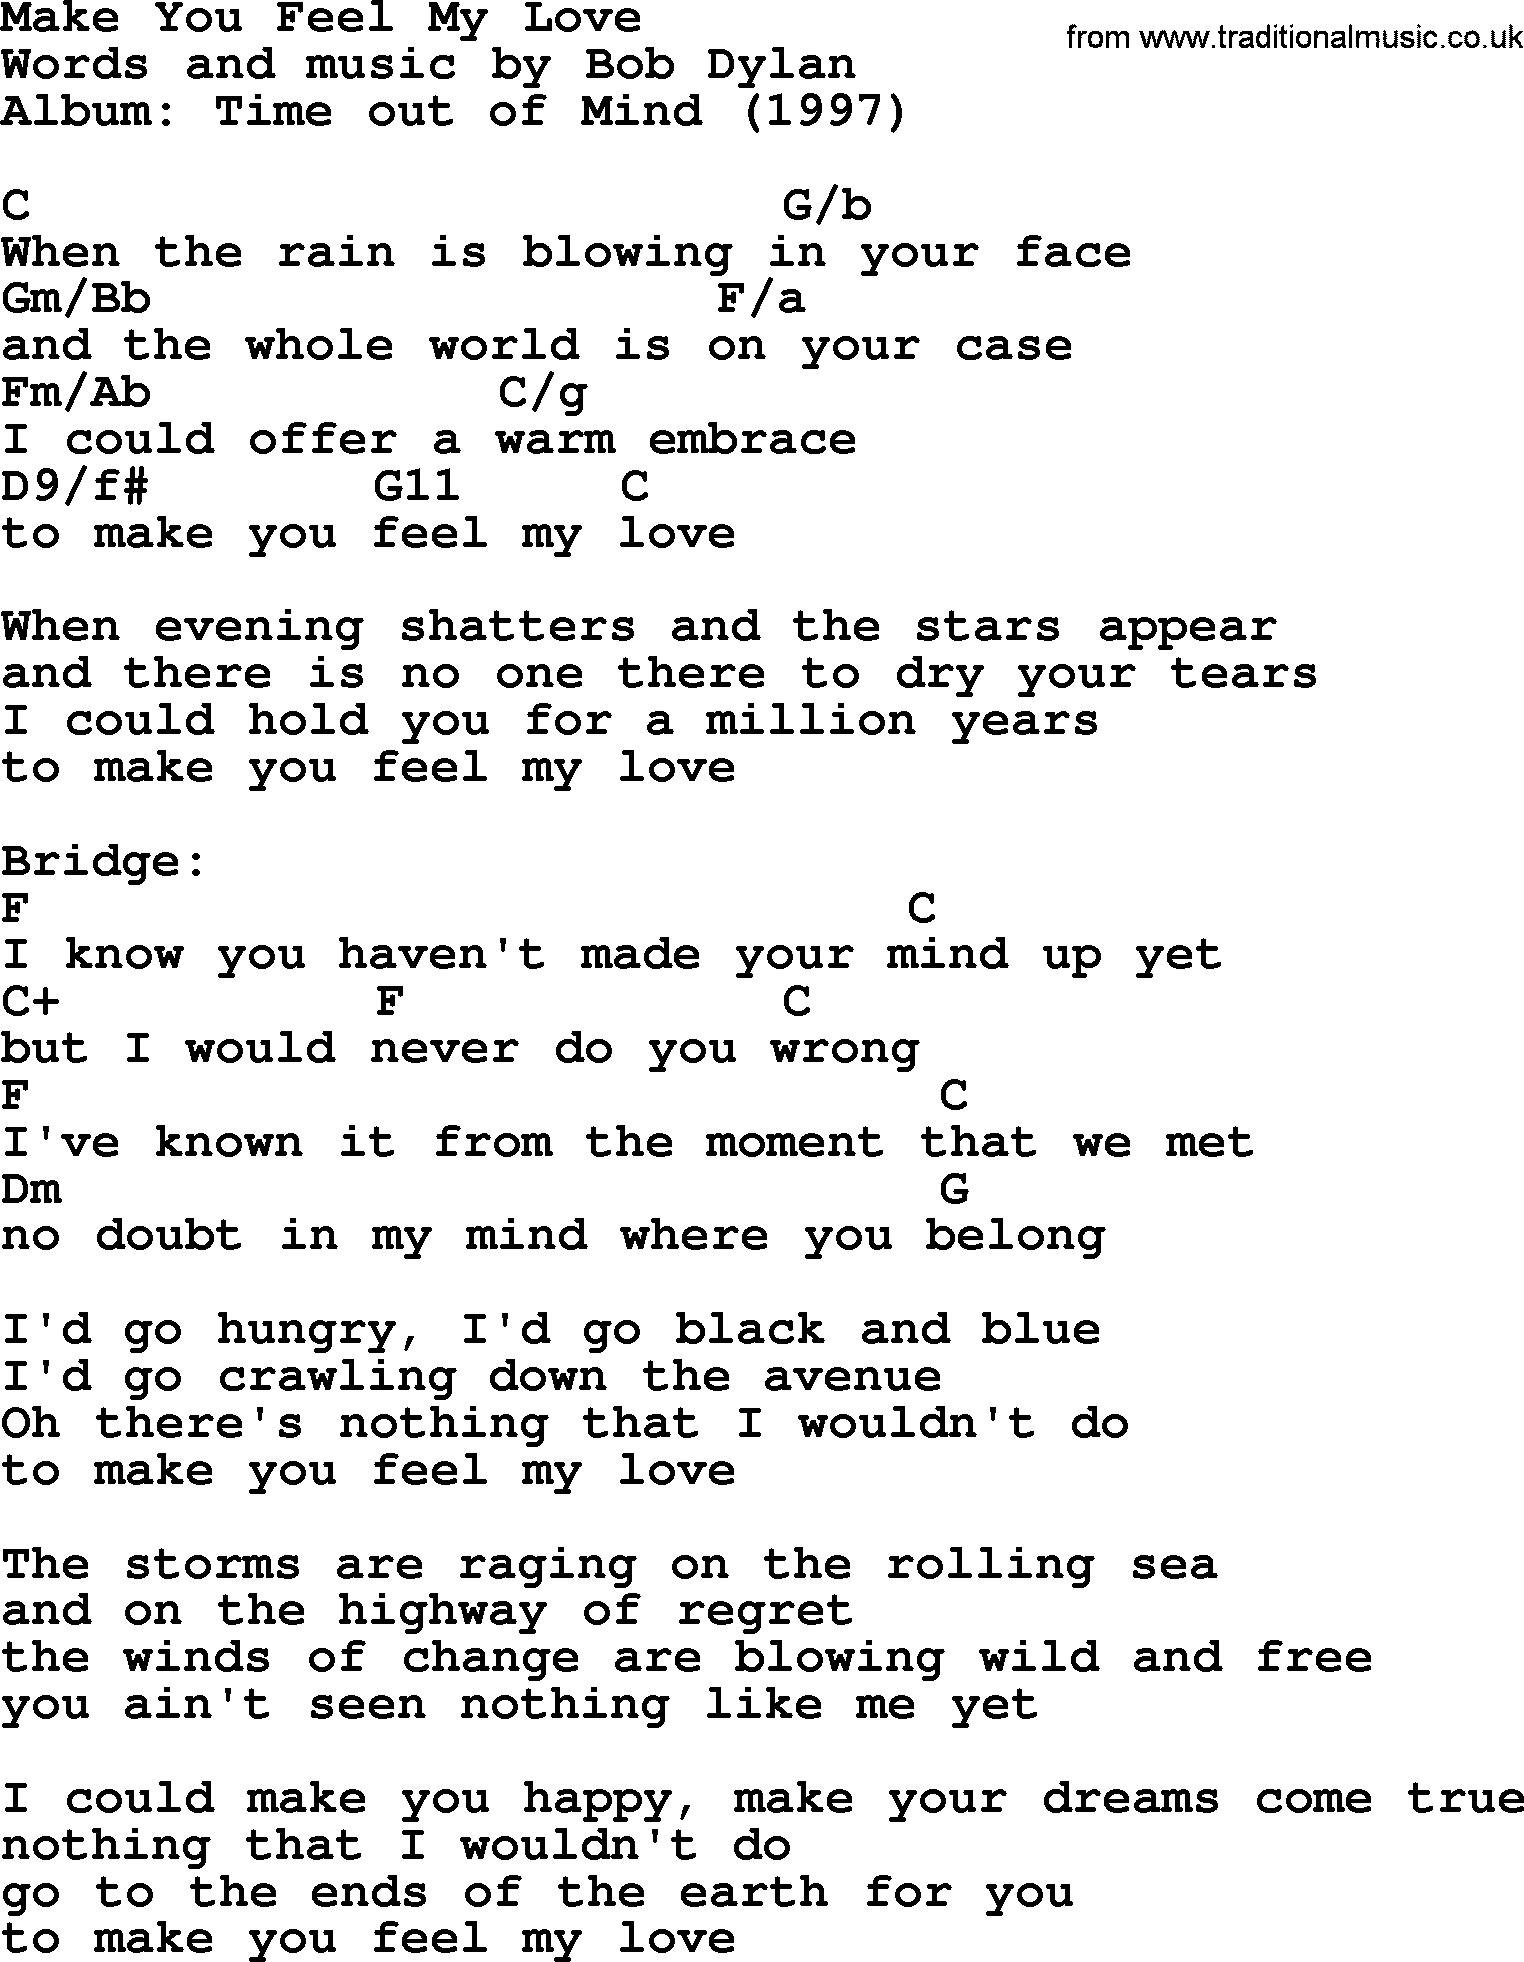 Make You Feel My Love Chords Bob Dylan Song Make You Feel My Love Lyrics And Chords